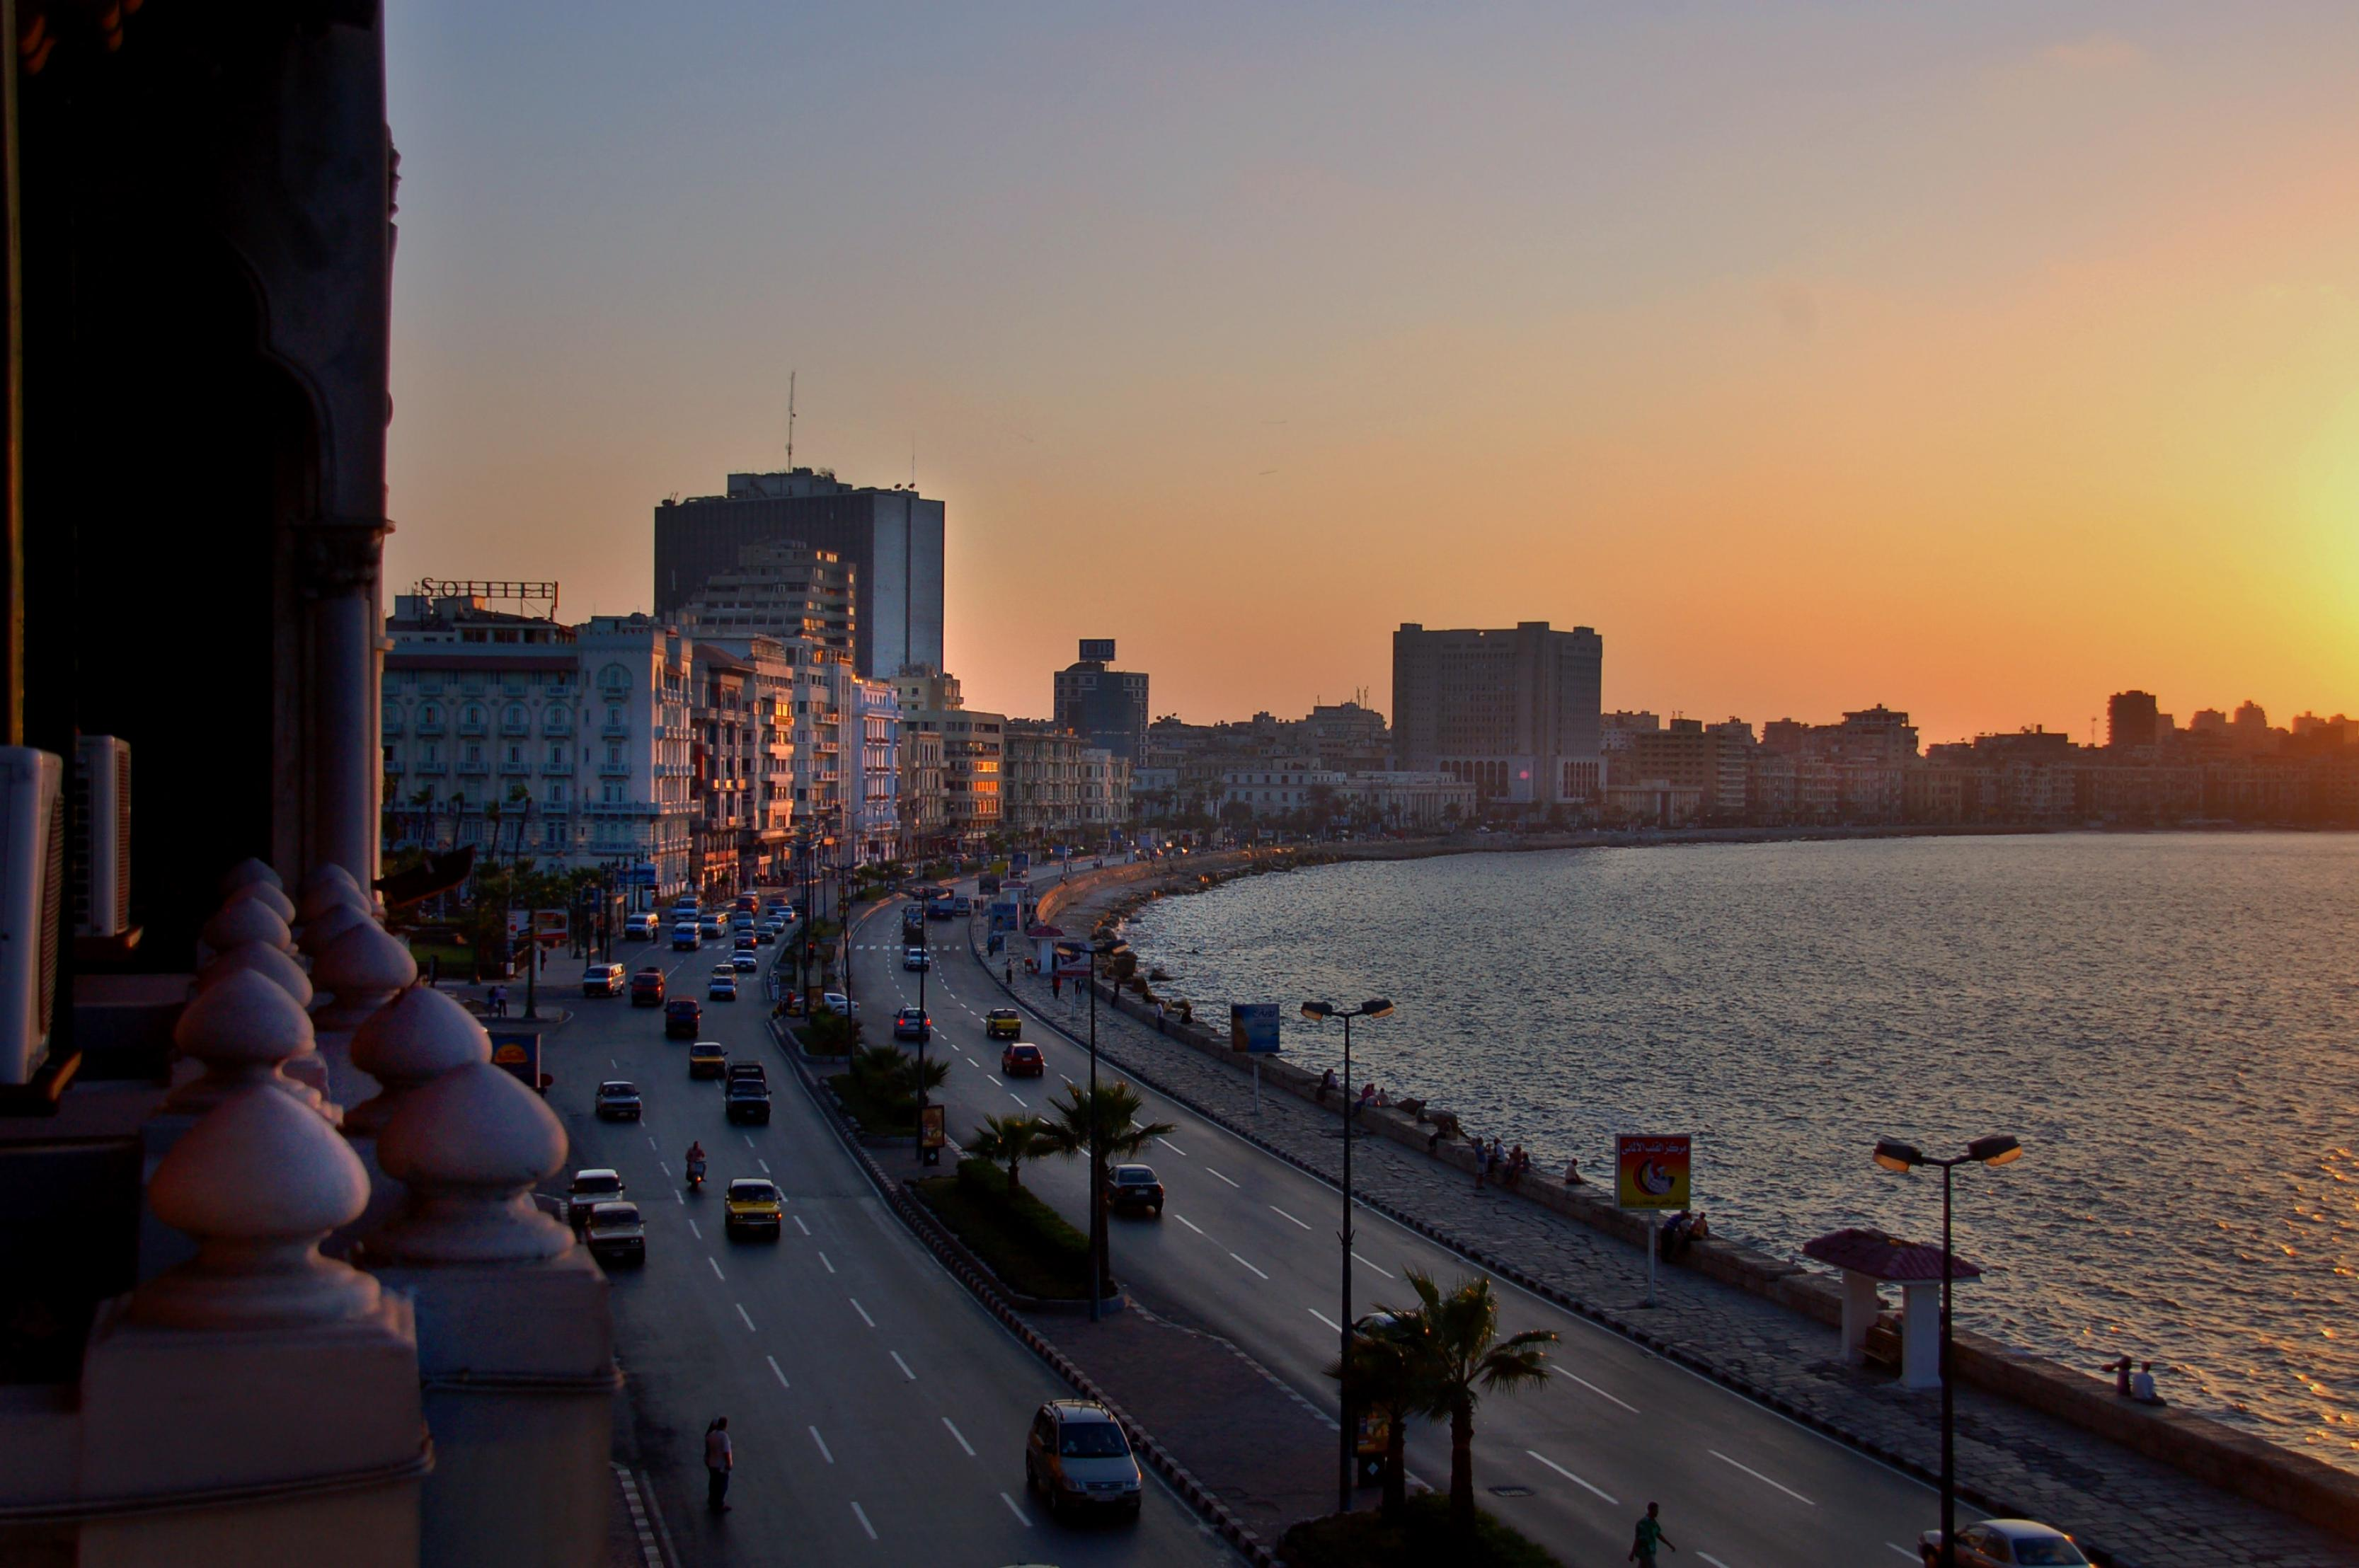 https://upload.wikimedia.org/wikipedia/commons/2/2f/Alexandria_-_Egypt.jpg